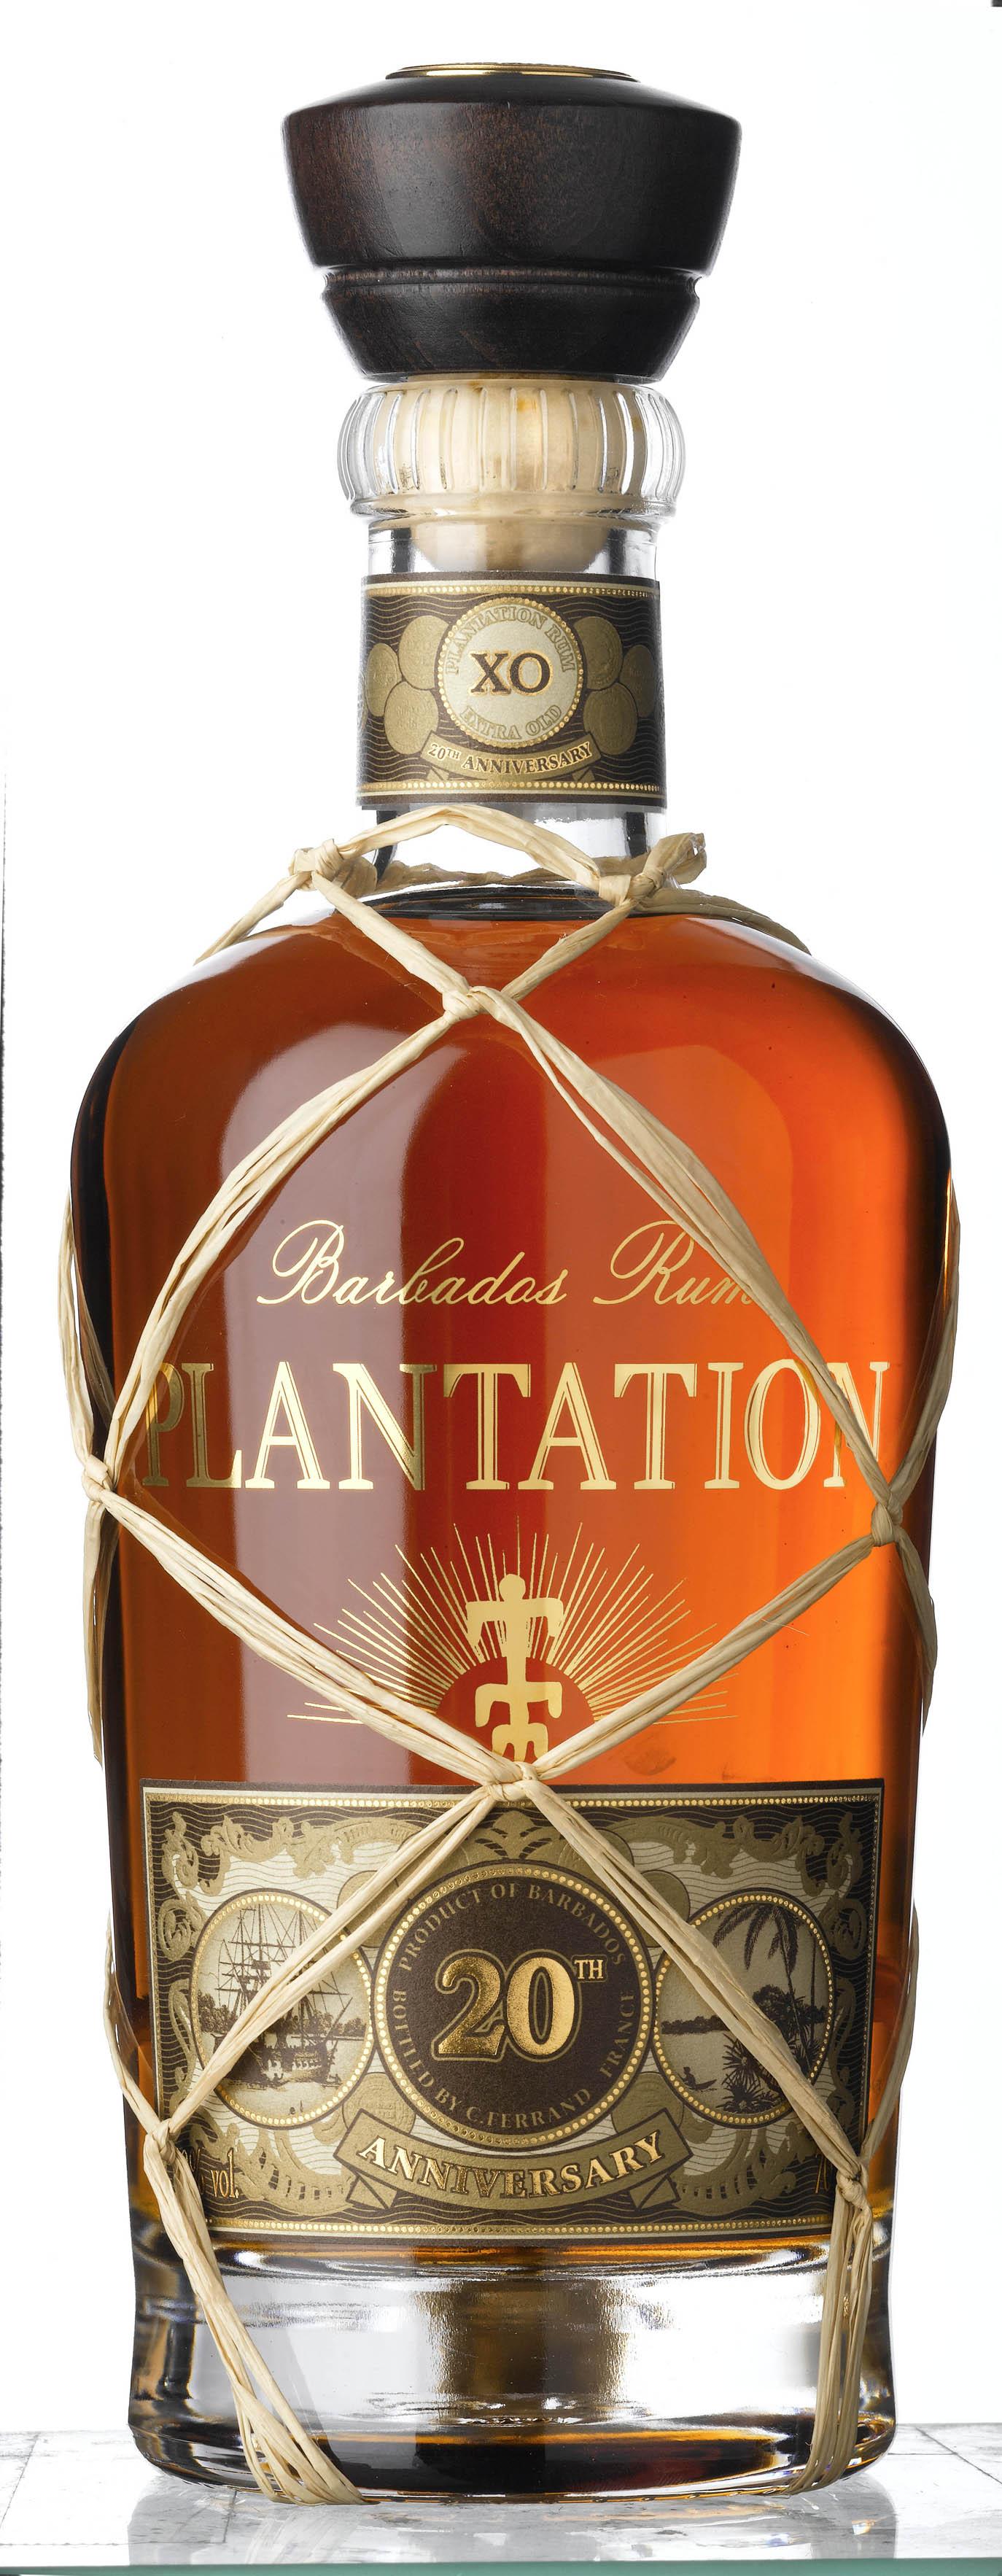 Plantation Rum Extra Old 20th Anniversary (2015)